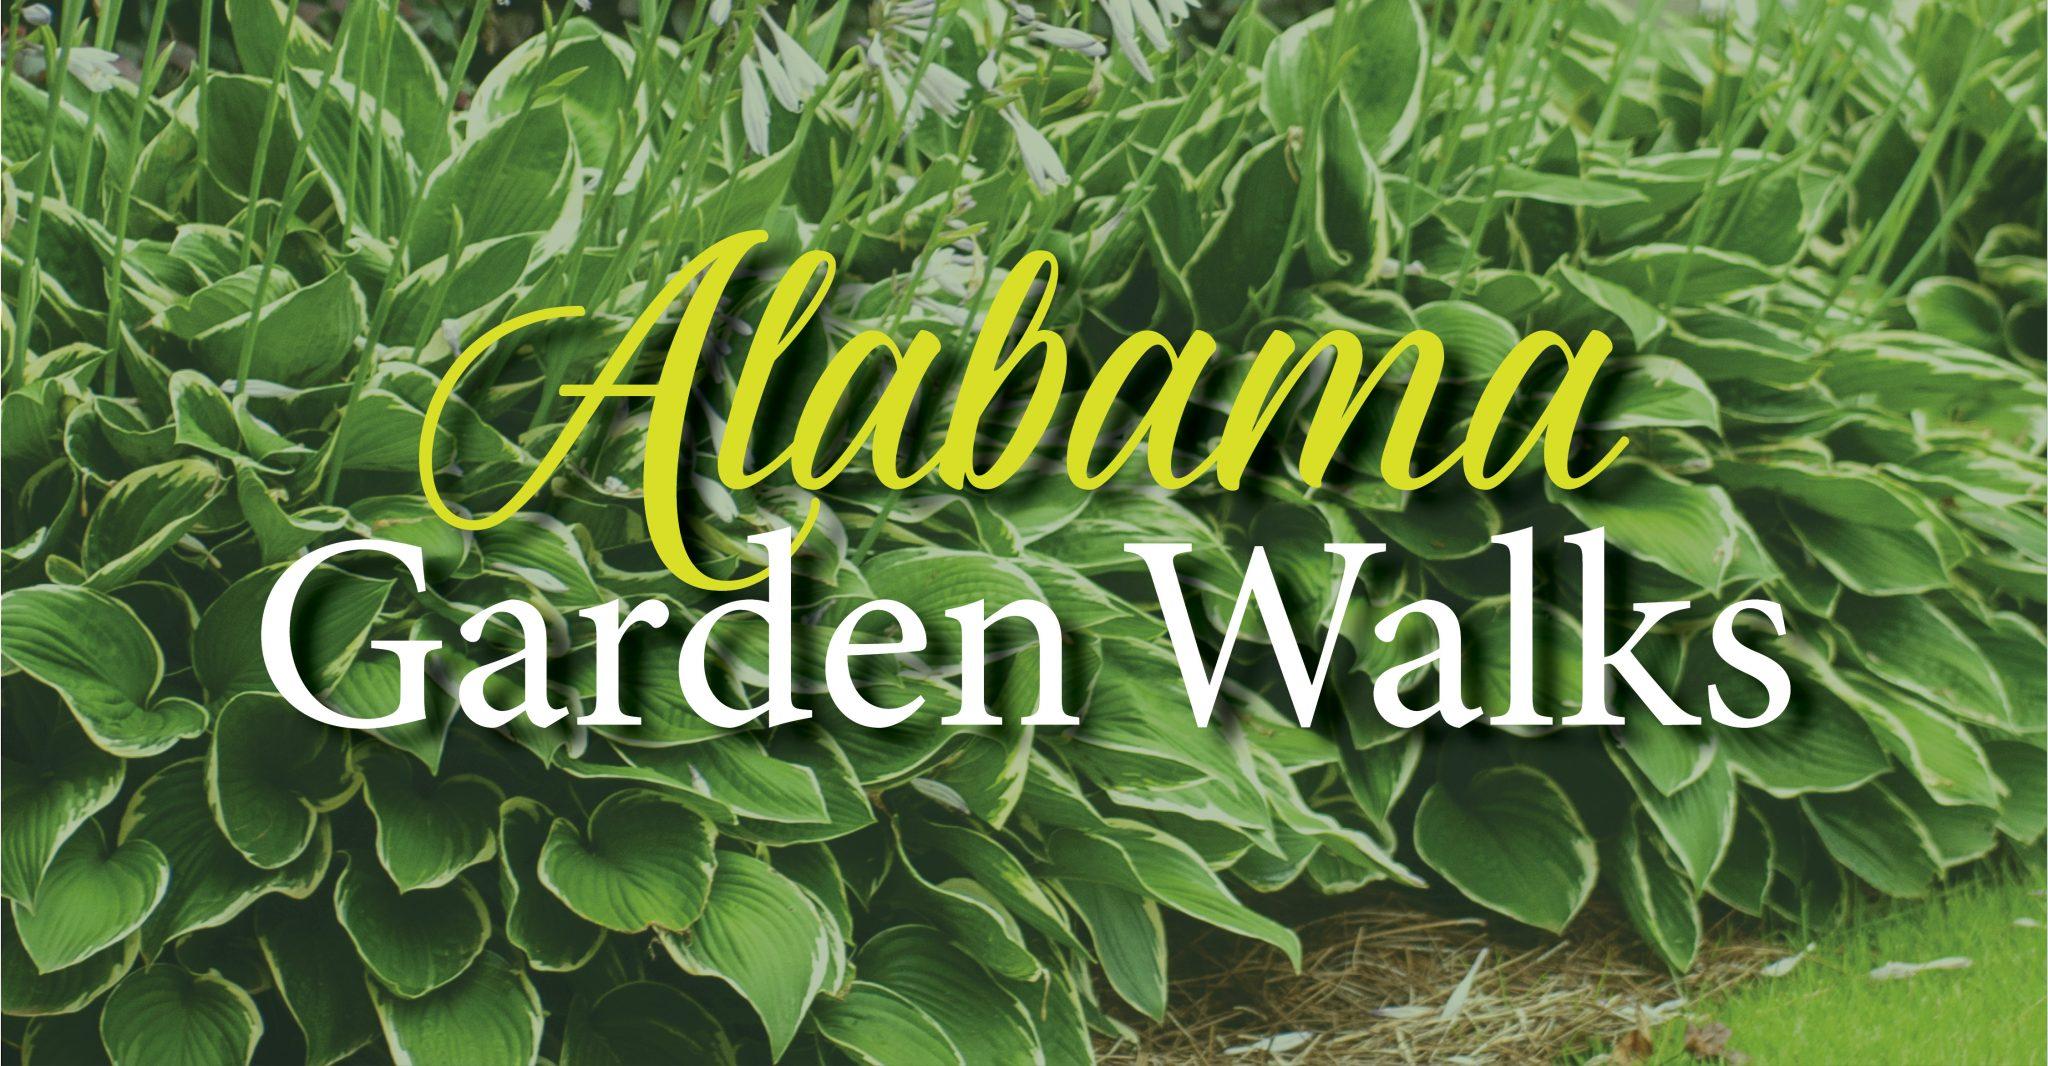 Close-up of Hosta plants with text: Alabama Garden Walks